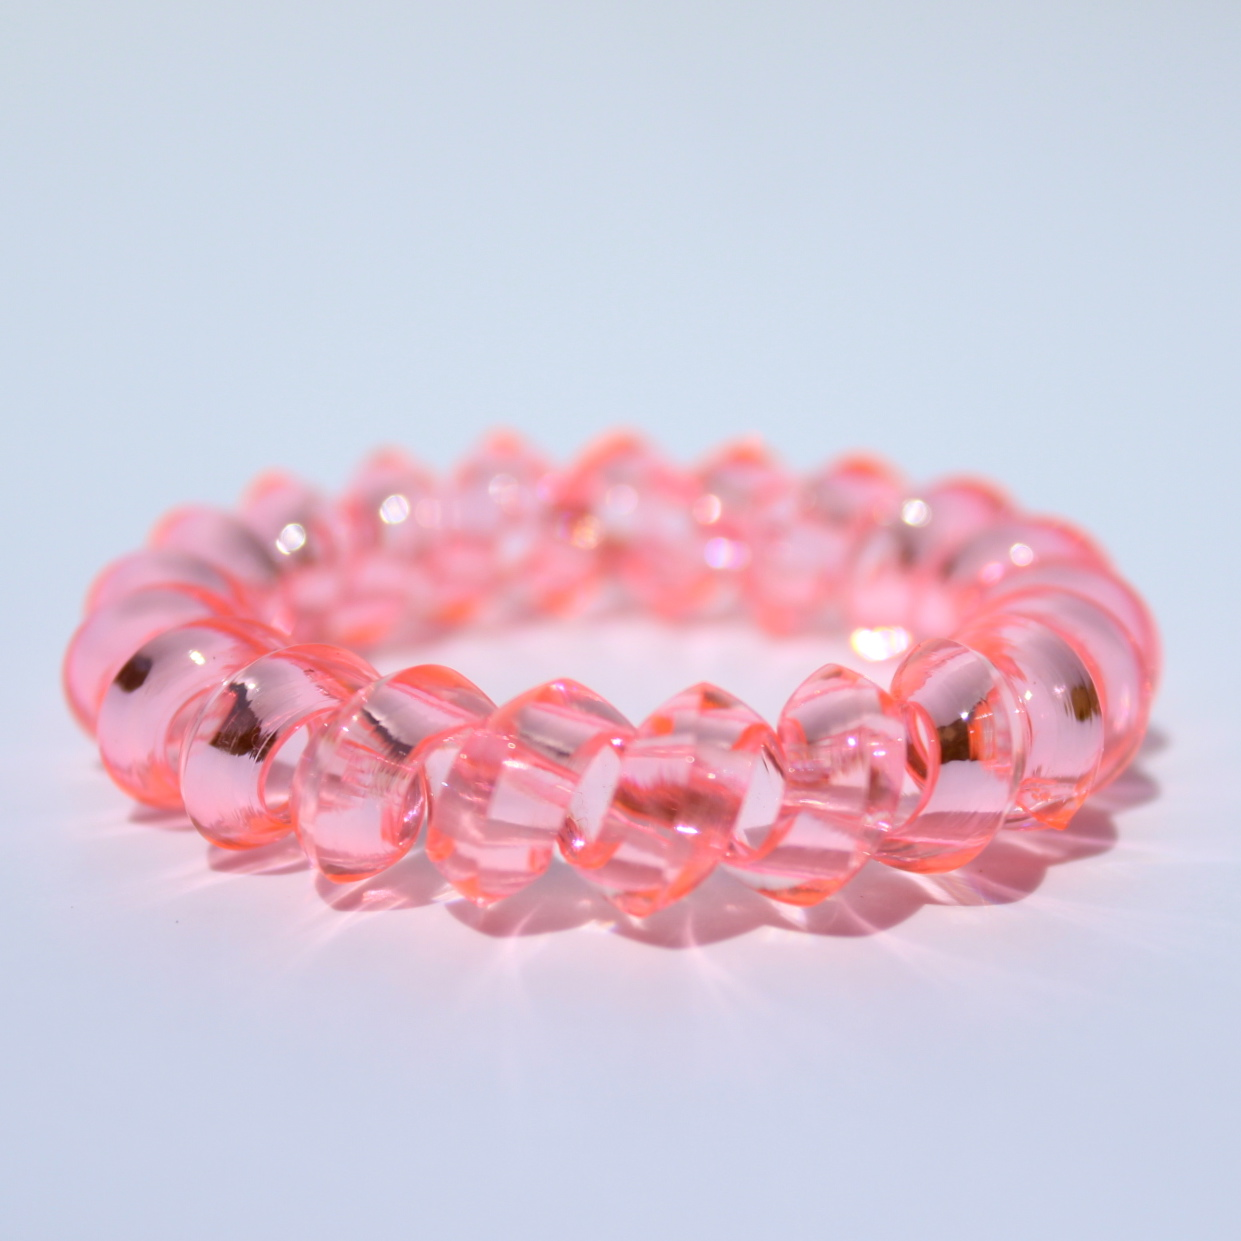 Bledoružová gumička do vlasov Hairfix - Crystal Špicaté Light Pink 2